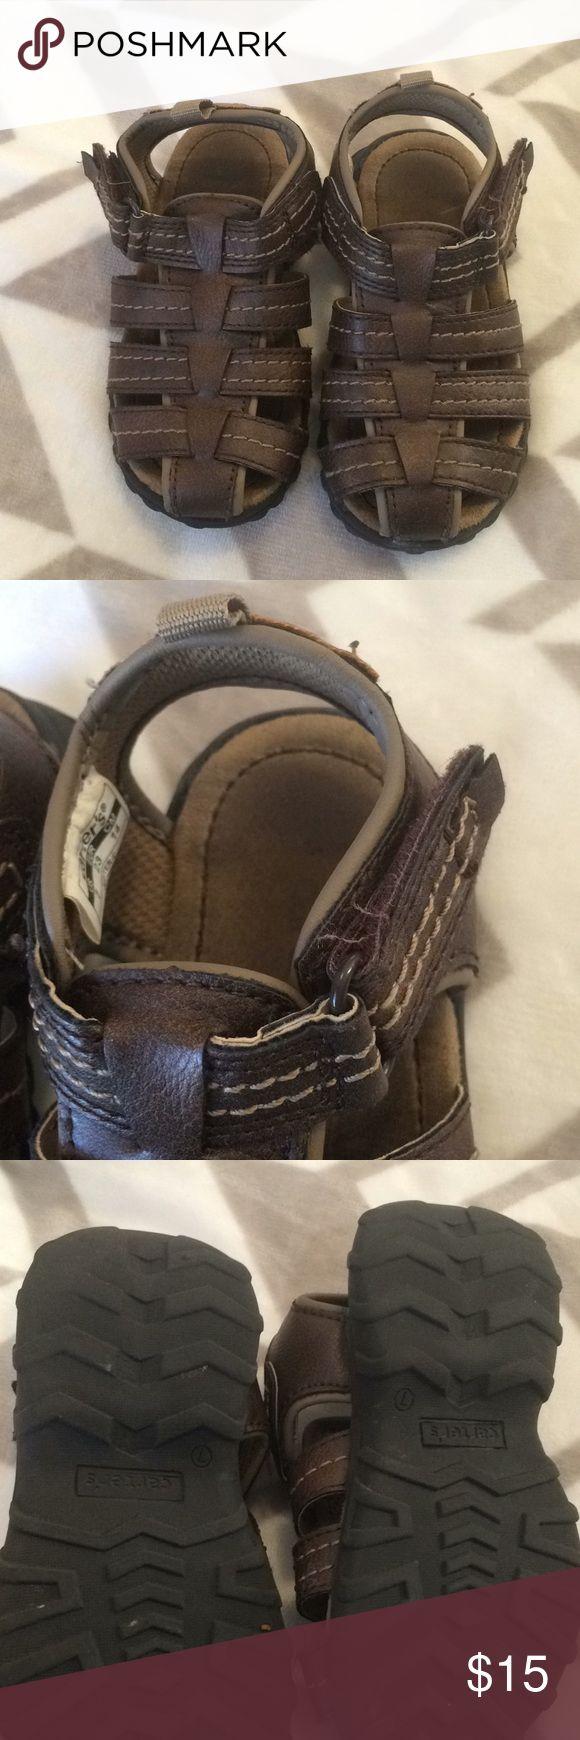 Toddler boys size 7 sandals Brown sandals with Velcro close Carter's Shoes Sandals & Flip Flops